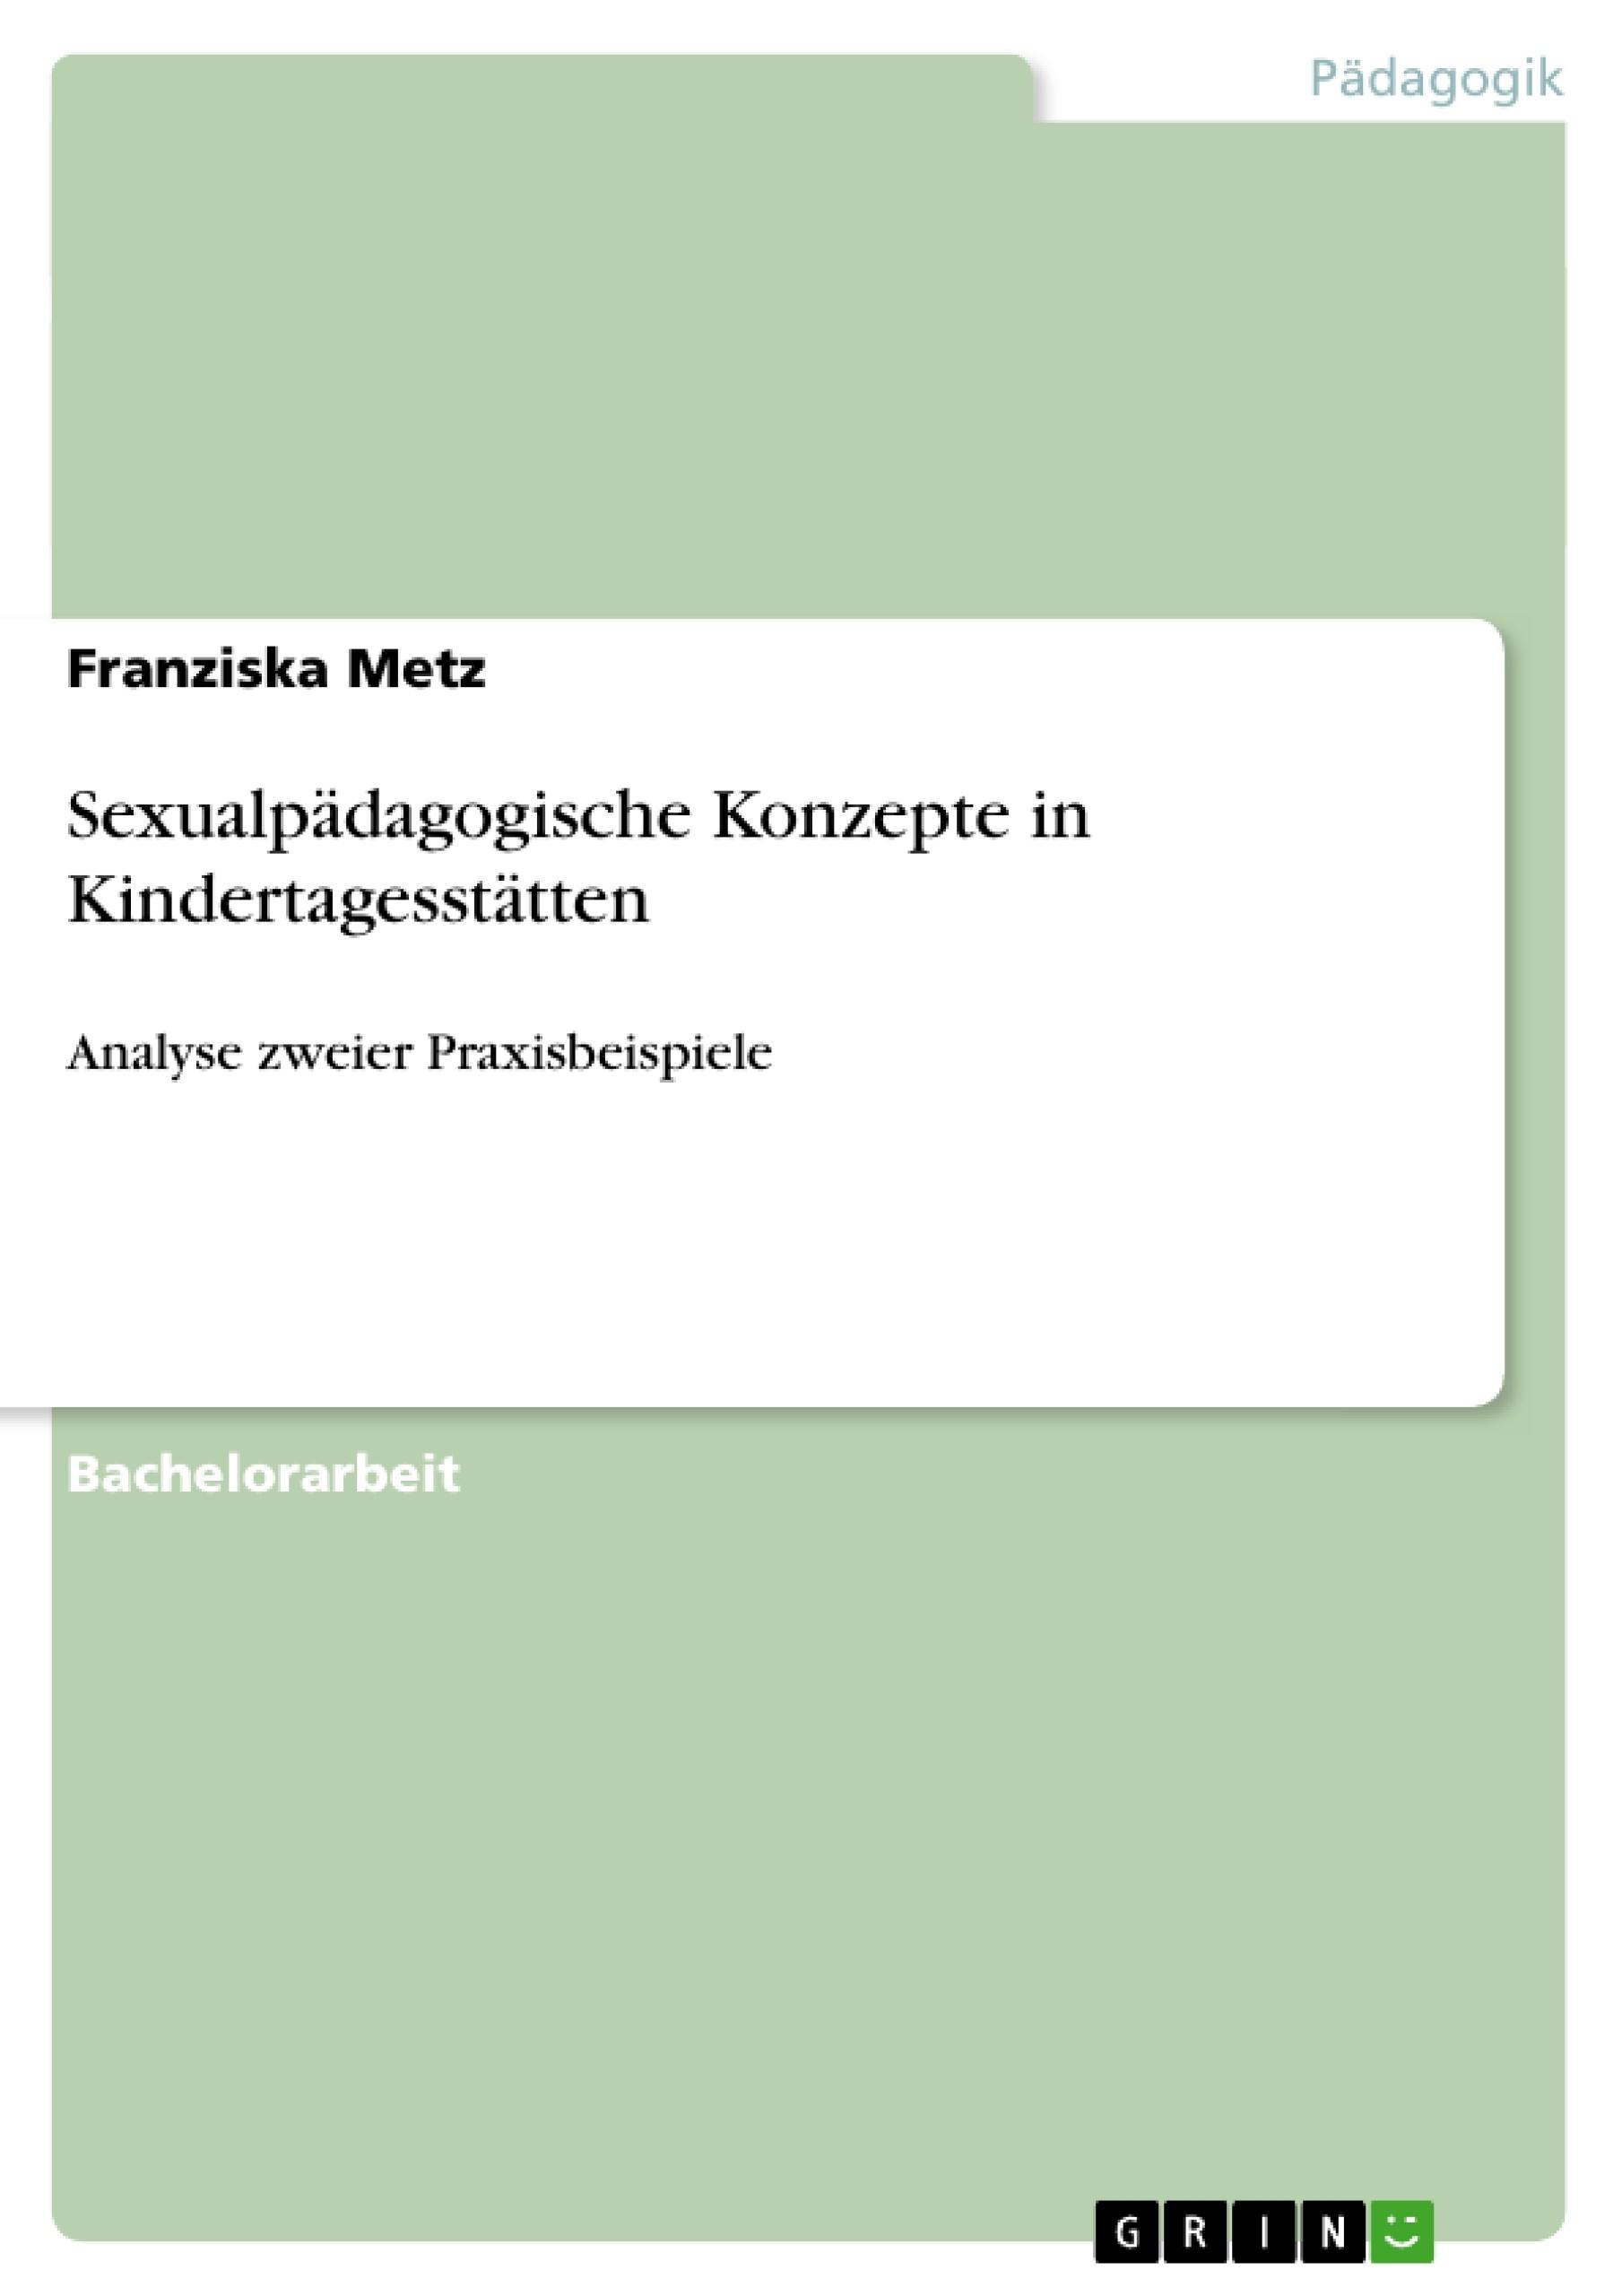 Titel: Sexualpädagogische Konzepte in Kindertagesstätten